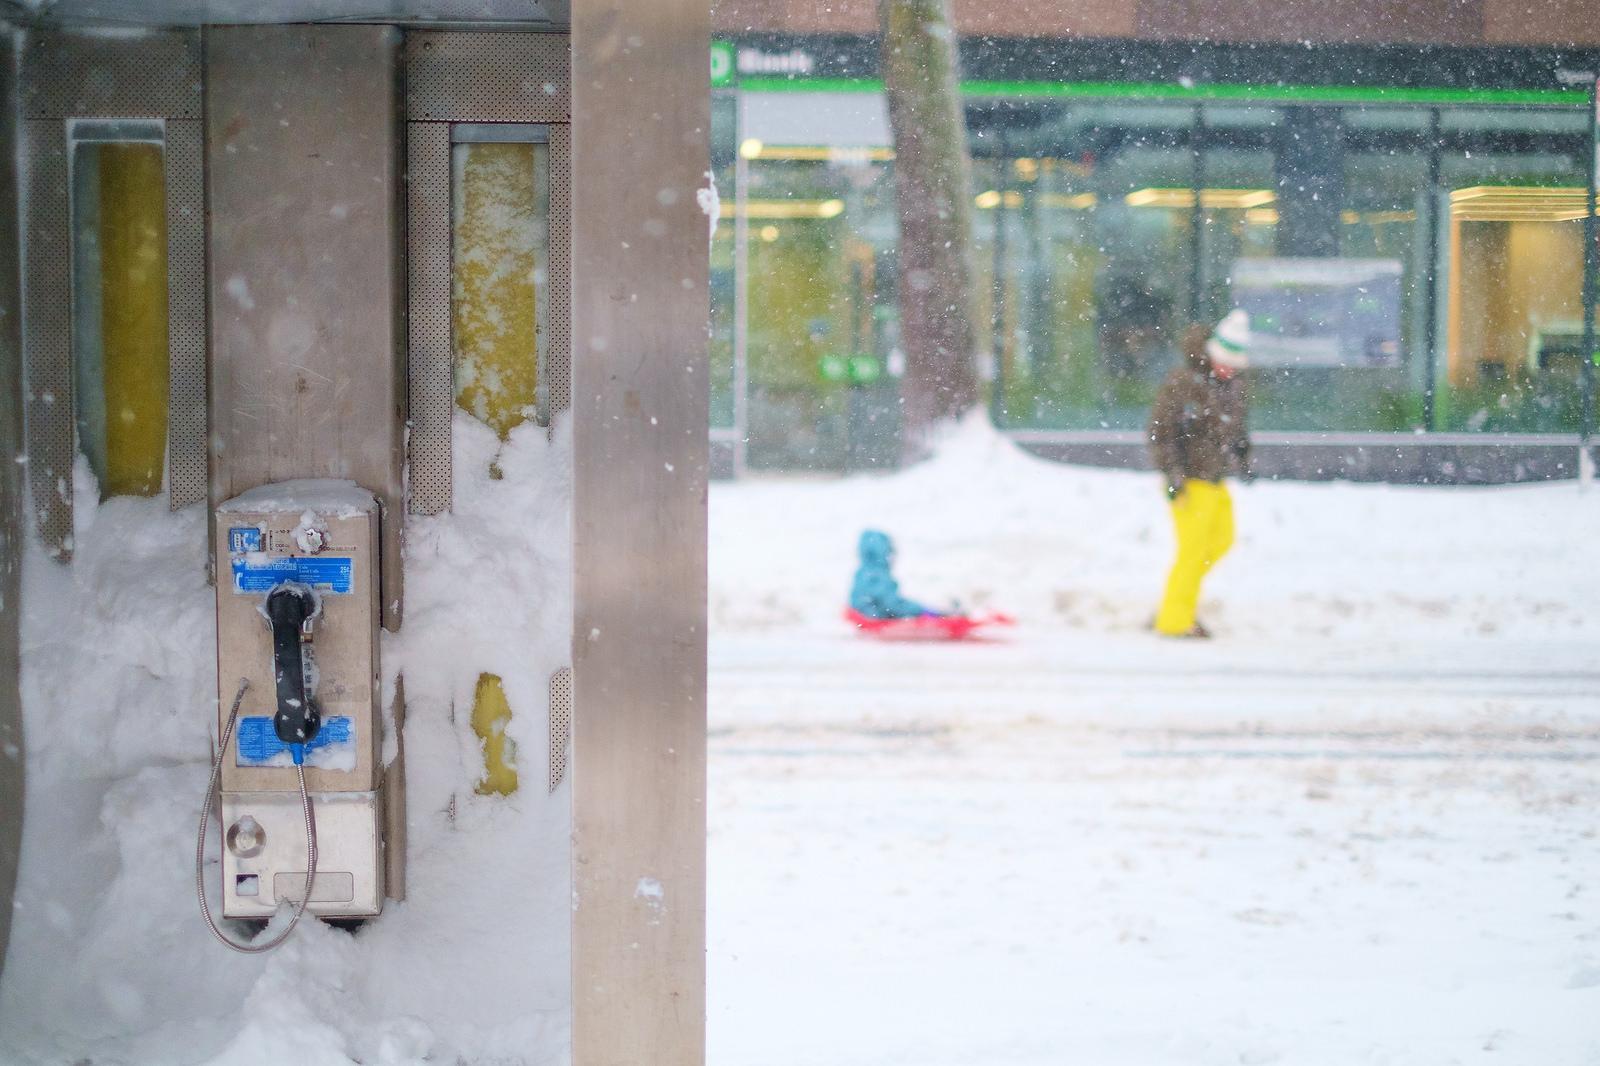 """Calling for snow"" January, 2016. Carroll Gardens, Brooklyn  Fujifilm XPro1, 35mm, f/1.4, 1/2000, ISO 640"